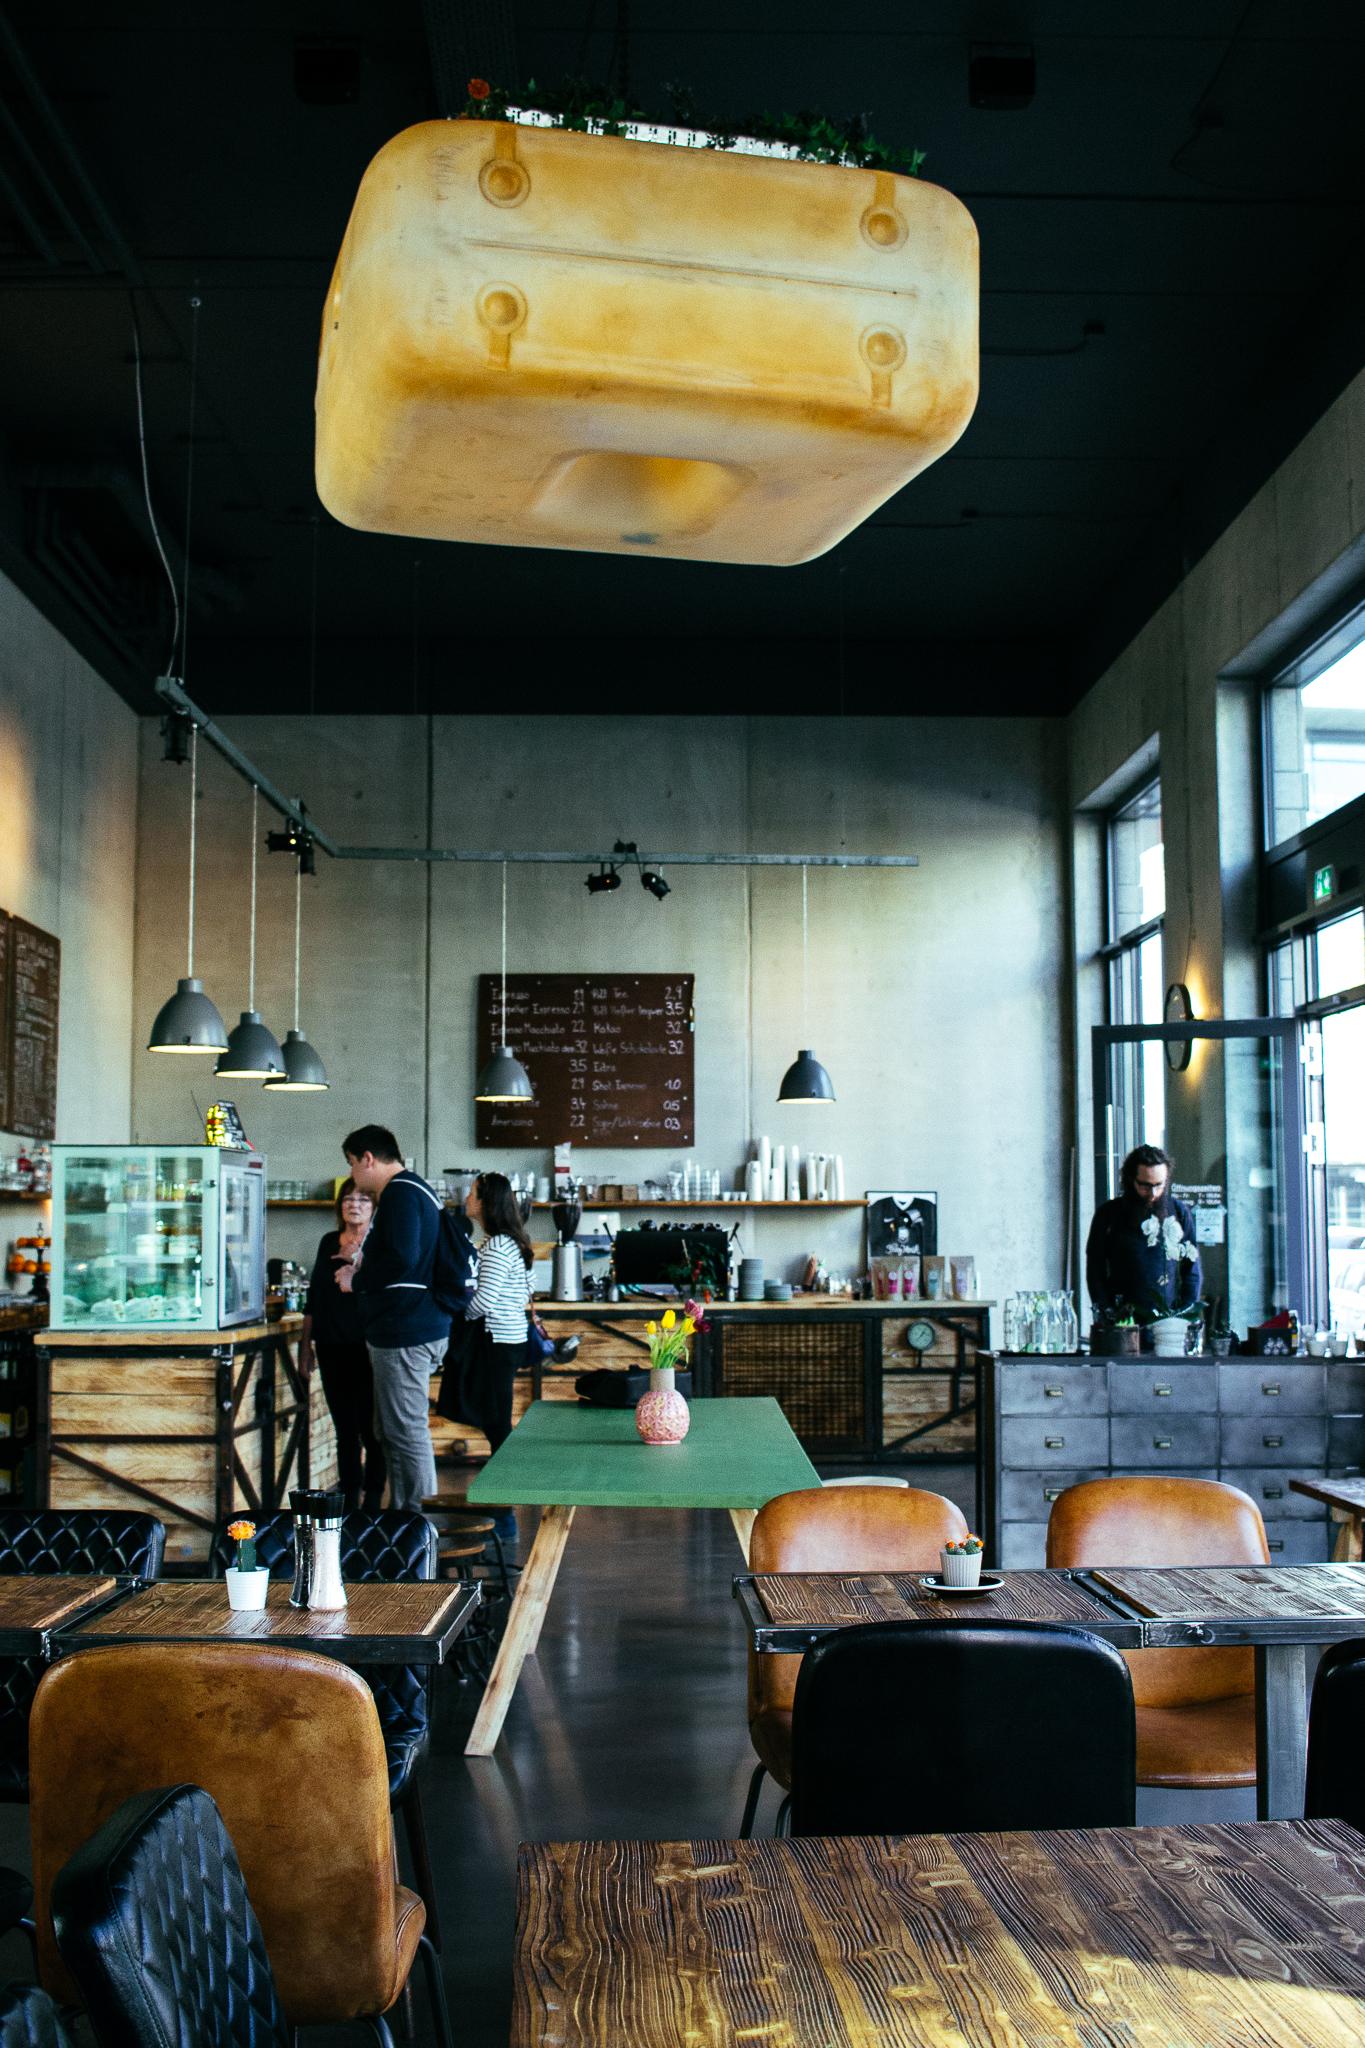 _MG_4537franz morish_kaffeehaus